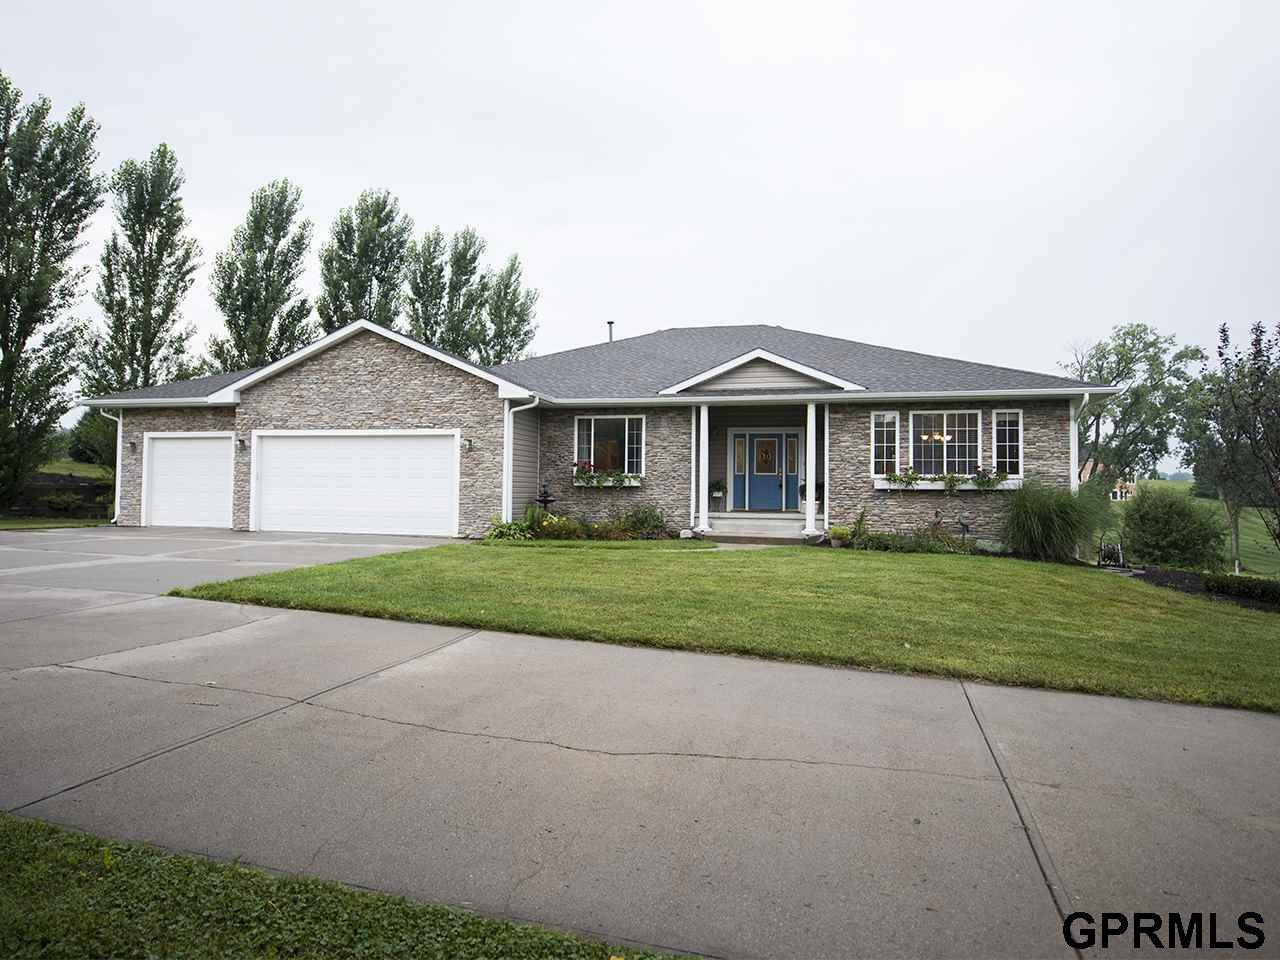 Real Estate for Sale, ListingId: 34947207, Blair,NE68008